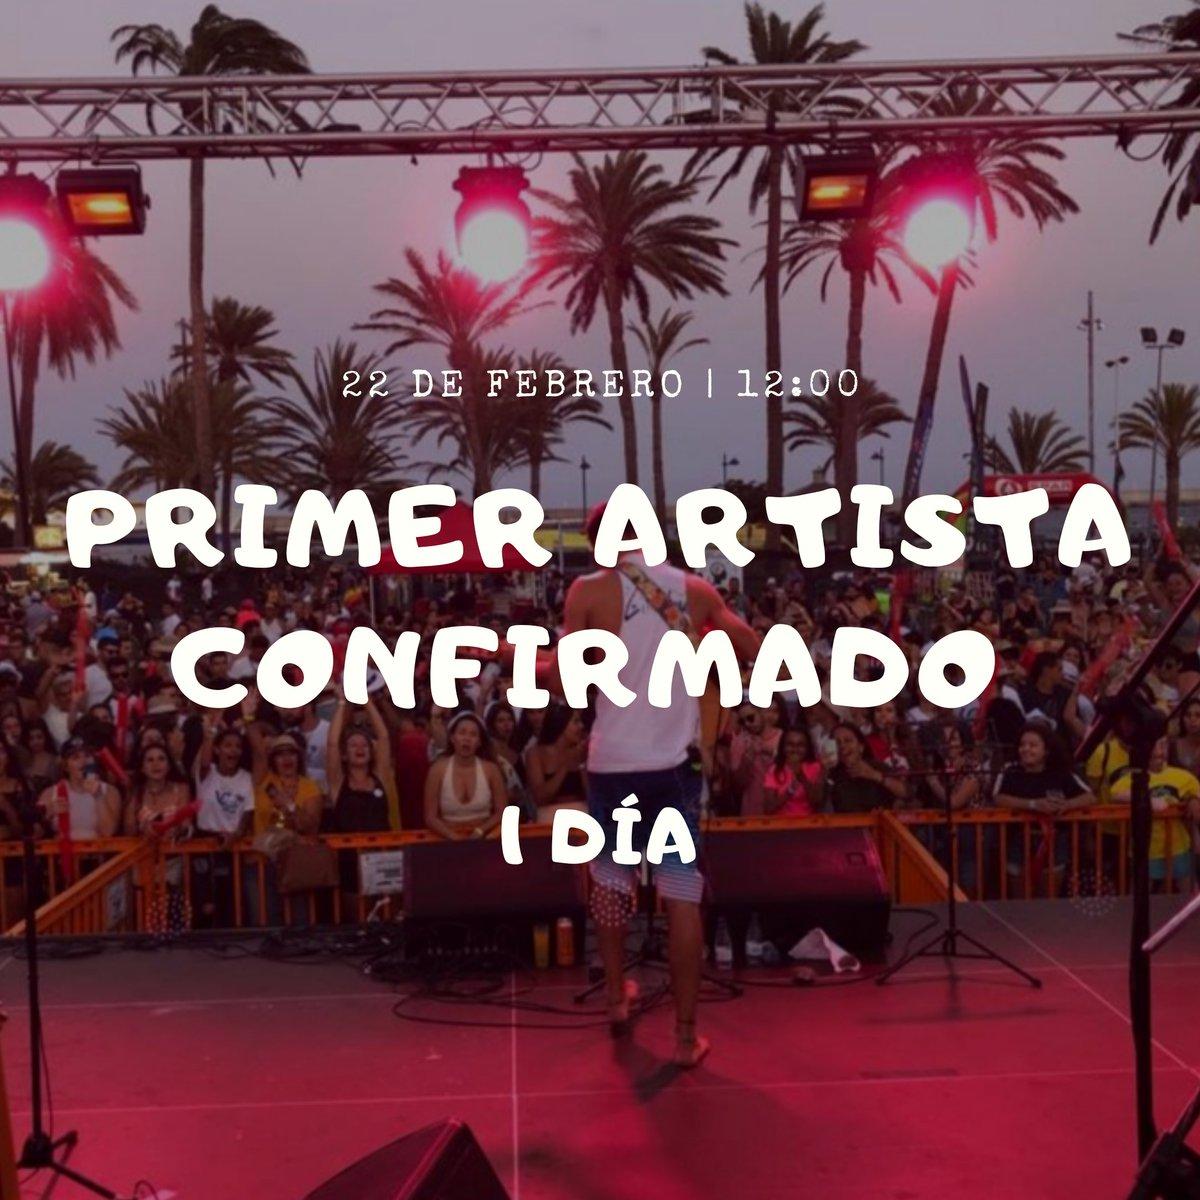 ¡NO QUEDA NADA! #SS2020 #LaGomera #Canariaspic.twitter.com/aIeWmL7HGQ